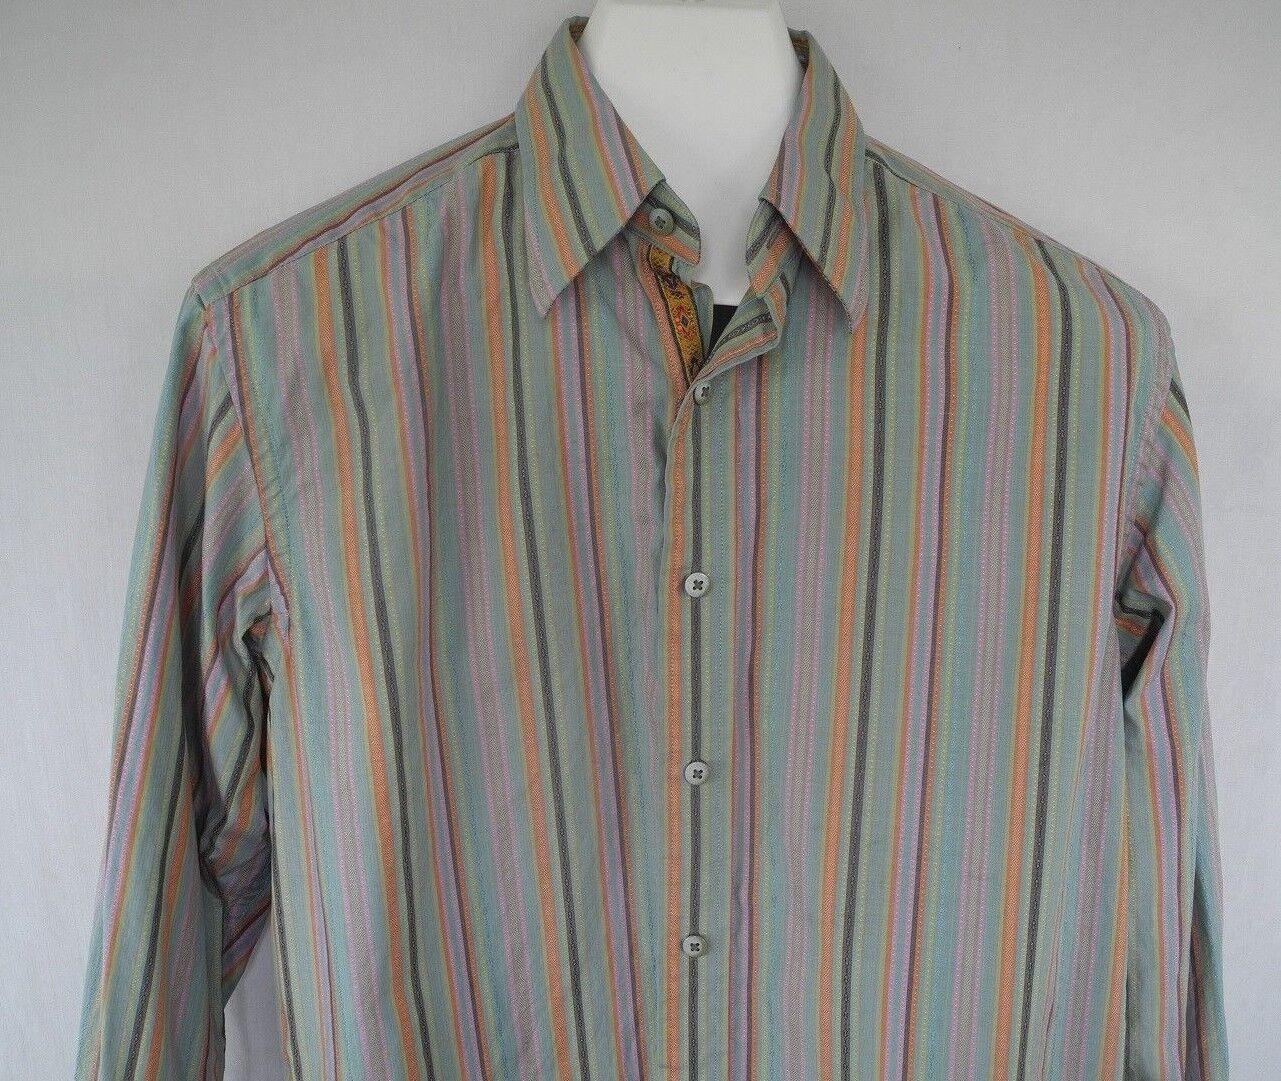 Robert Graham Button Front Shirt Flip Cuff Green Pink orange Striped Medium